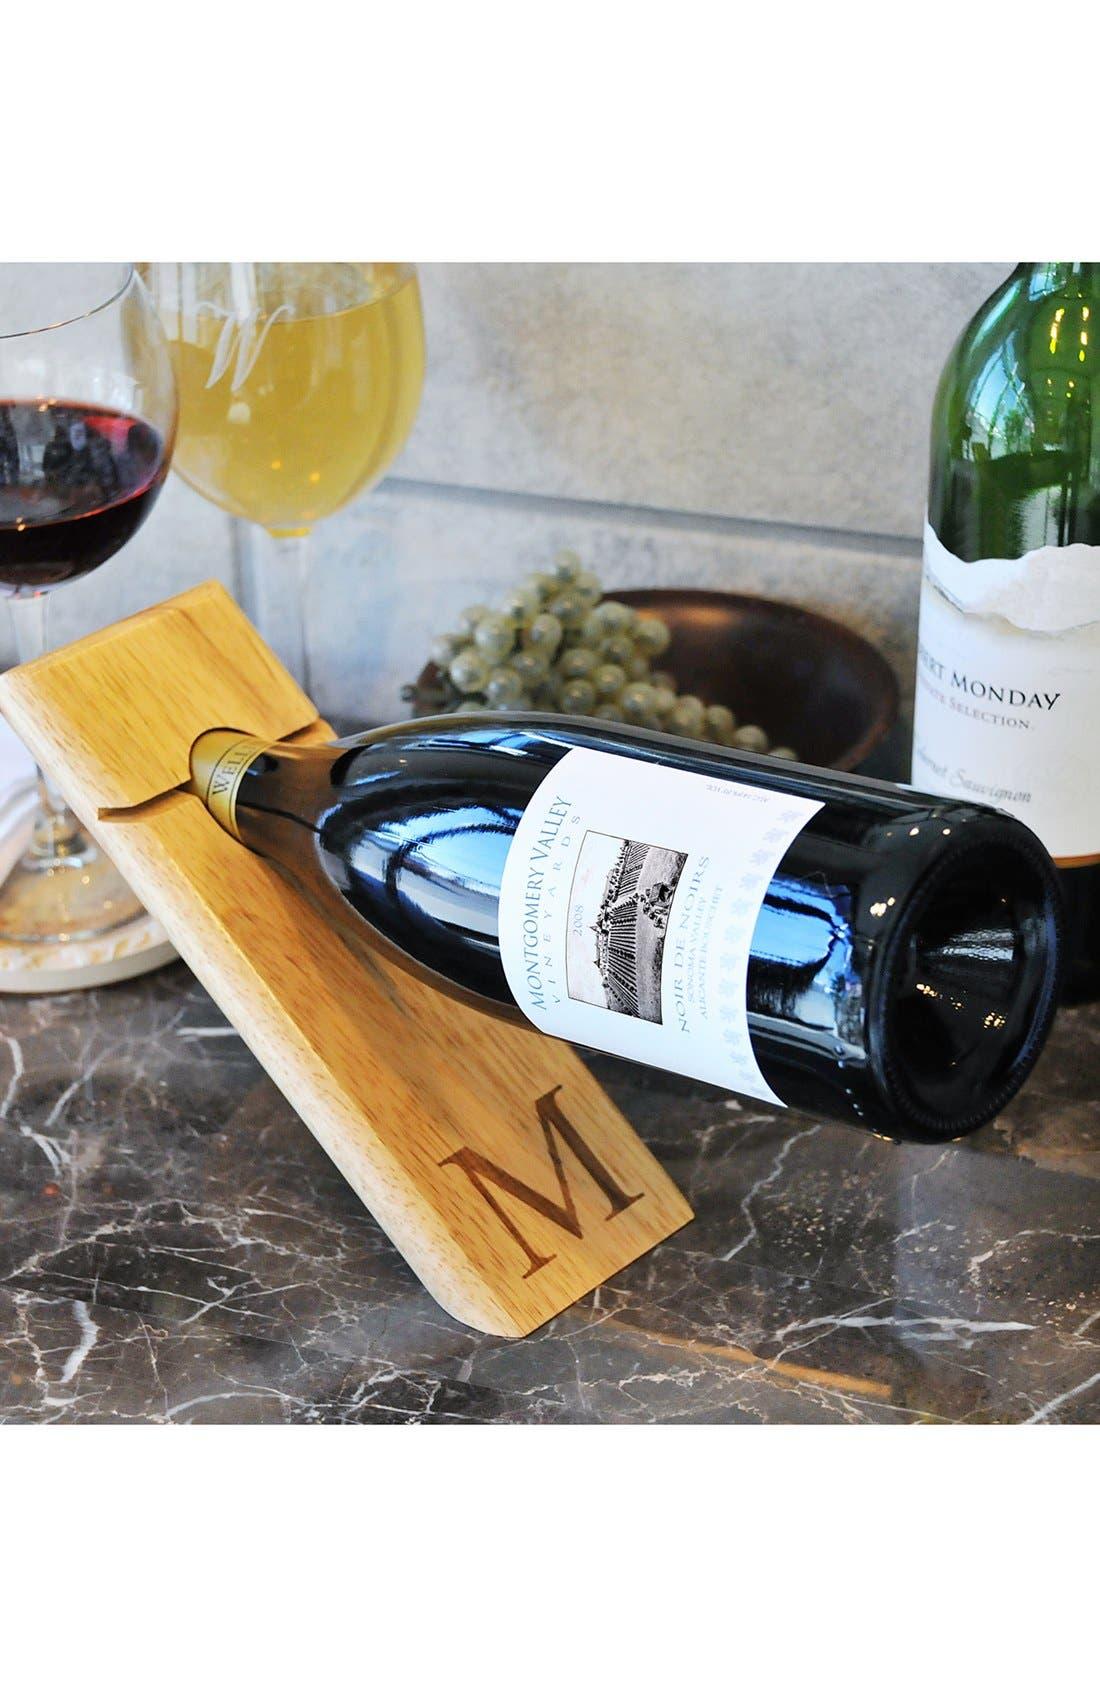 Alternate Image 1 Selected - Cathy's Concepts Monogram Counter Balance Wine Bottle Holder